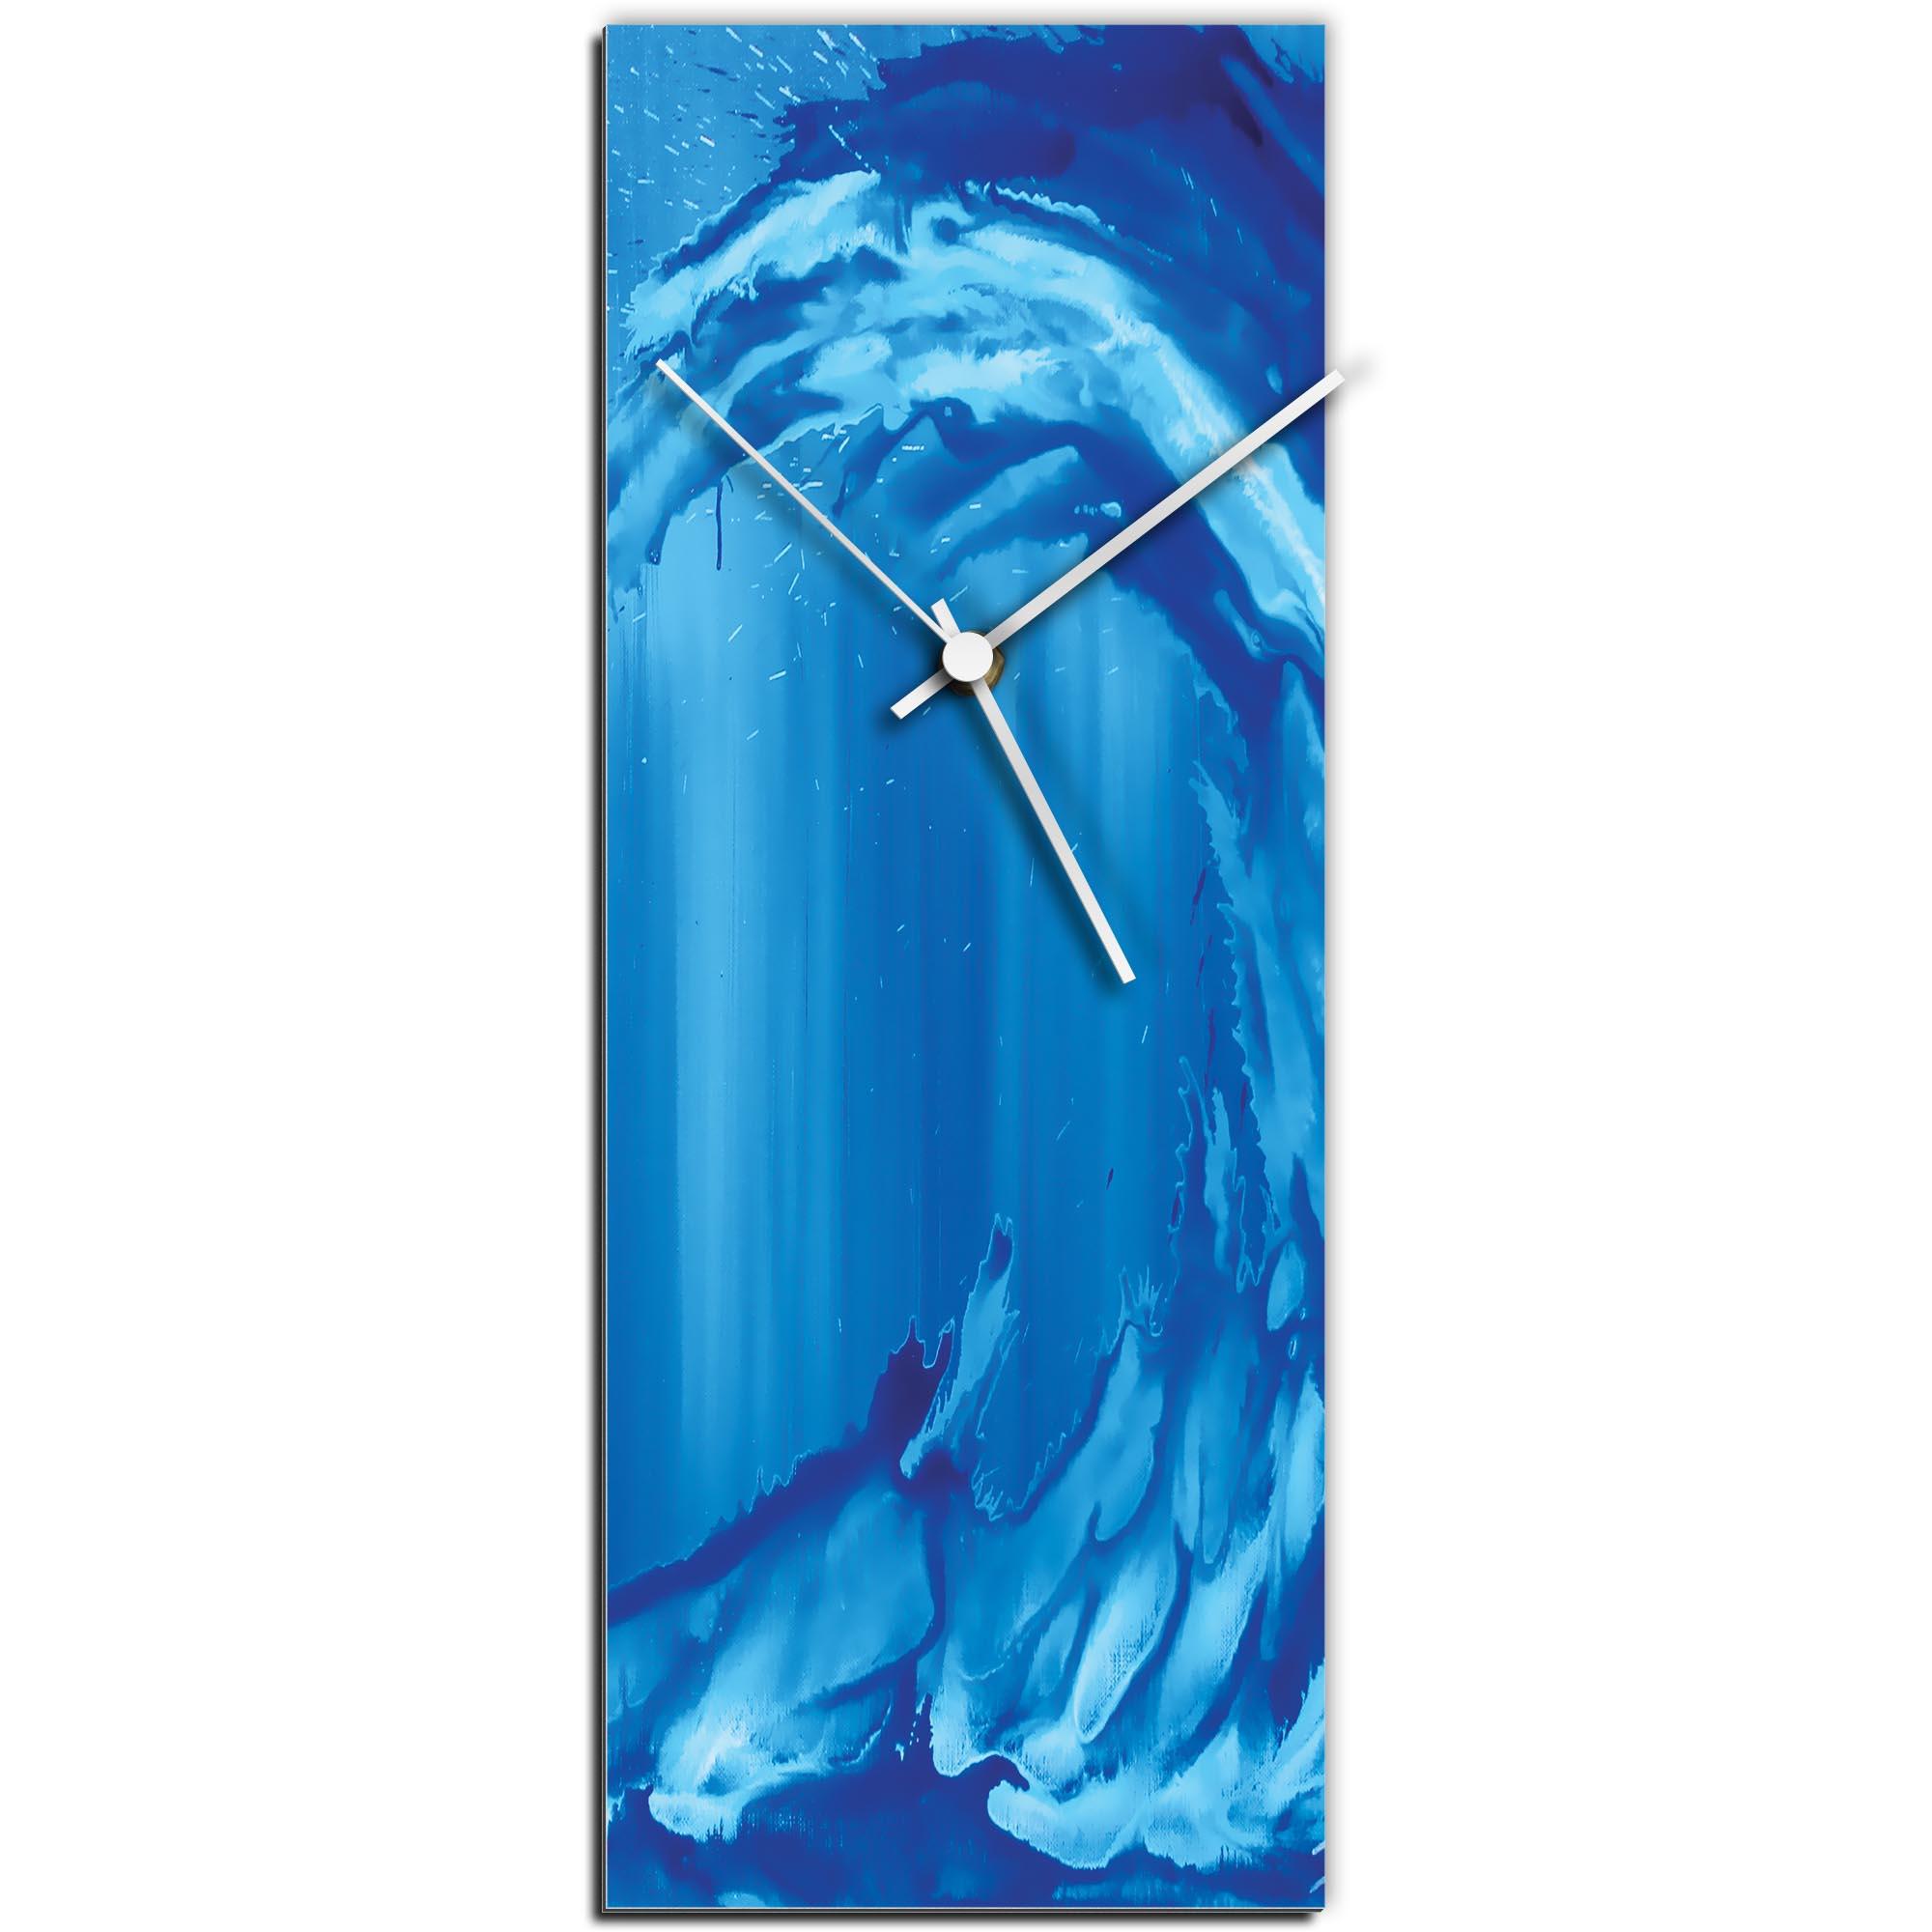 Mendo Vasilevski 'Blue Wave v2 Clock' 6in x 16in Modern Wall Clock on Aluminum Composite